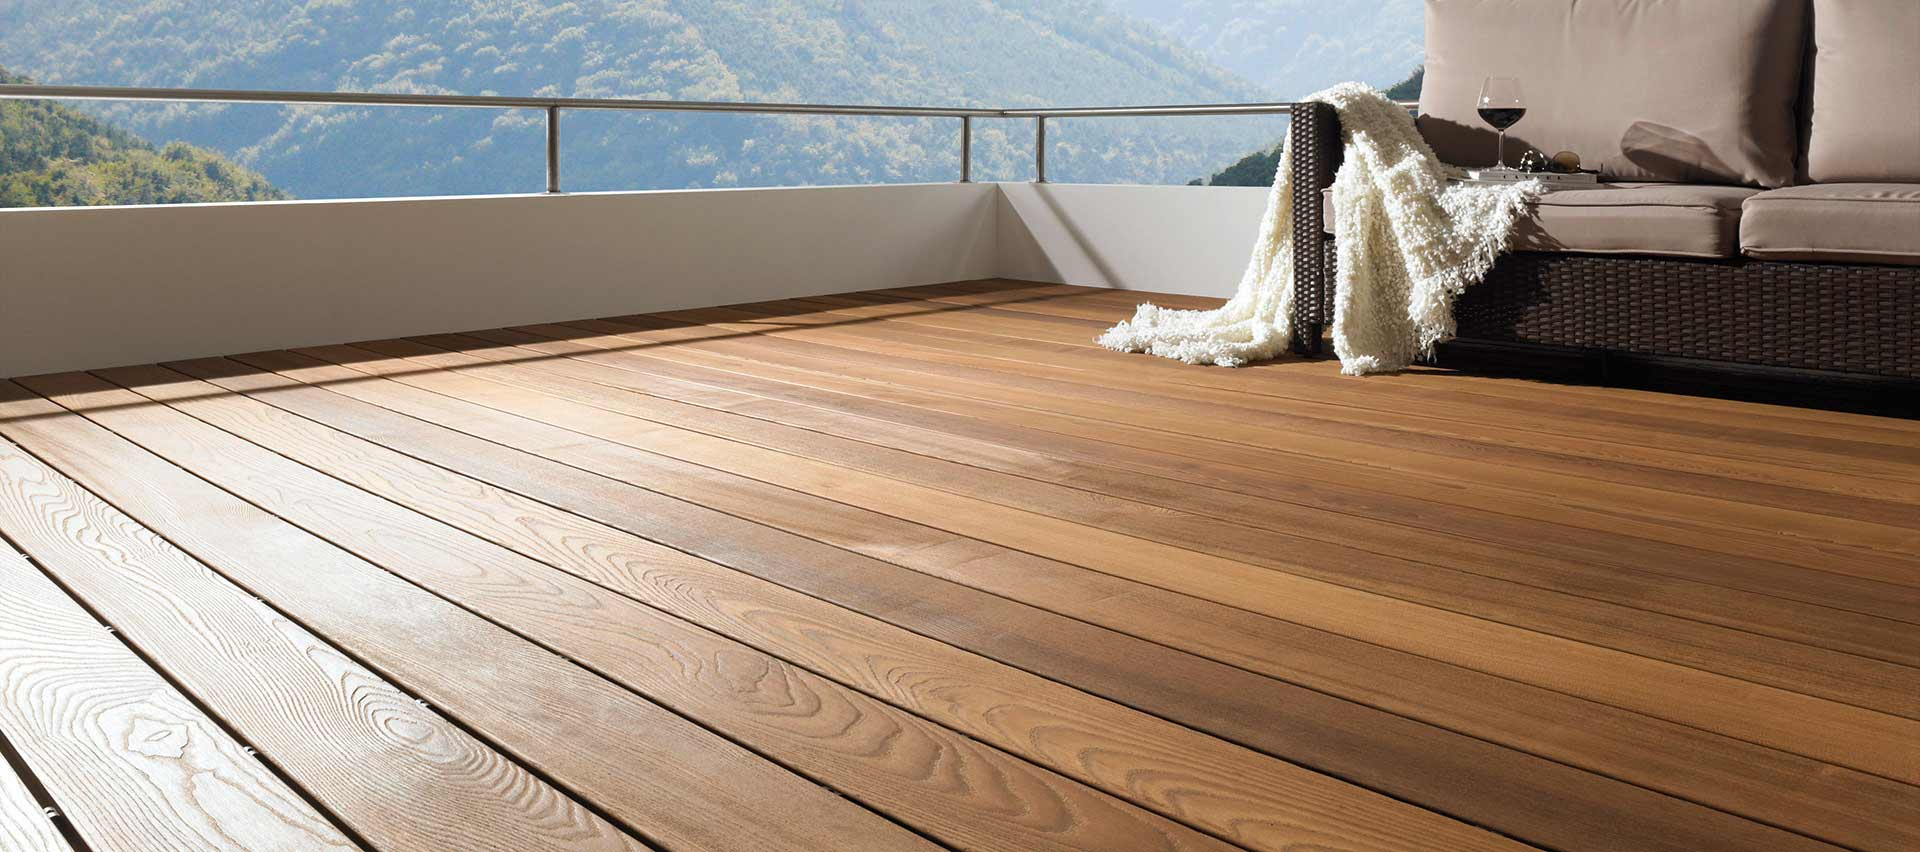 Holz Terrassenbelag Muster Verlegen